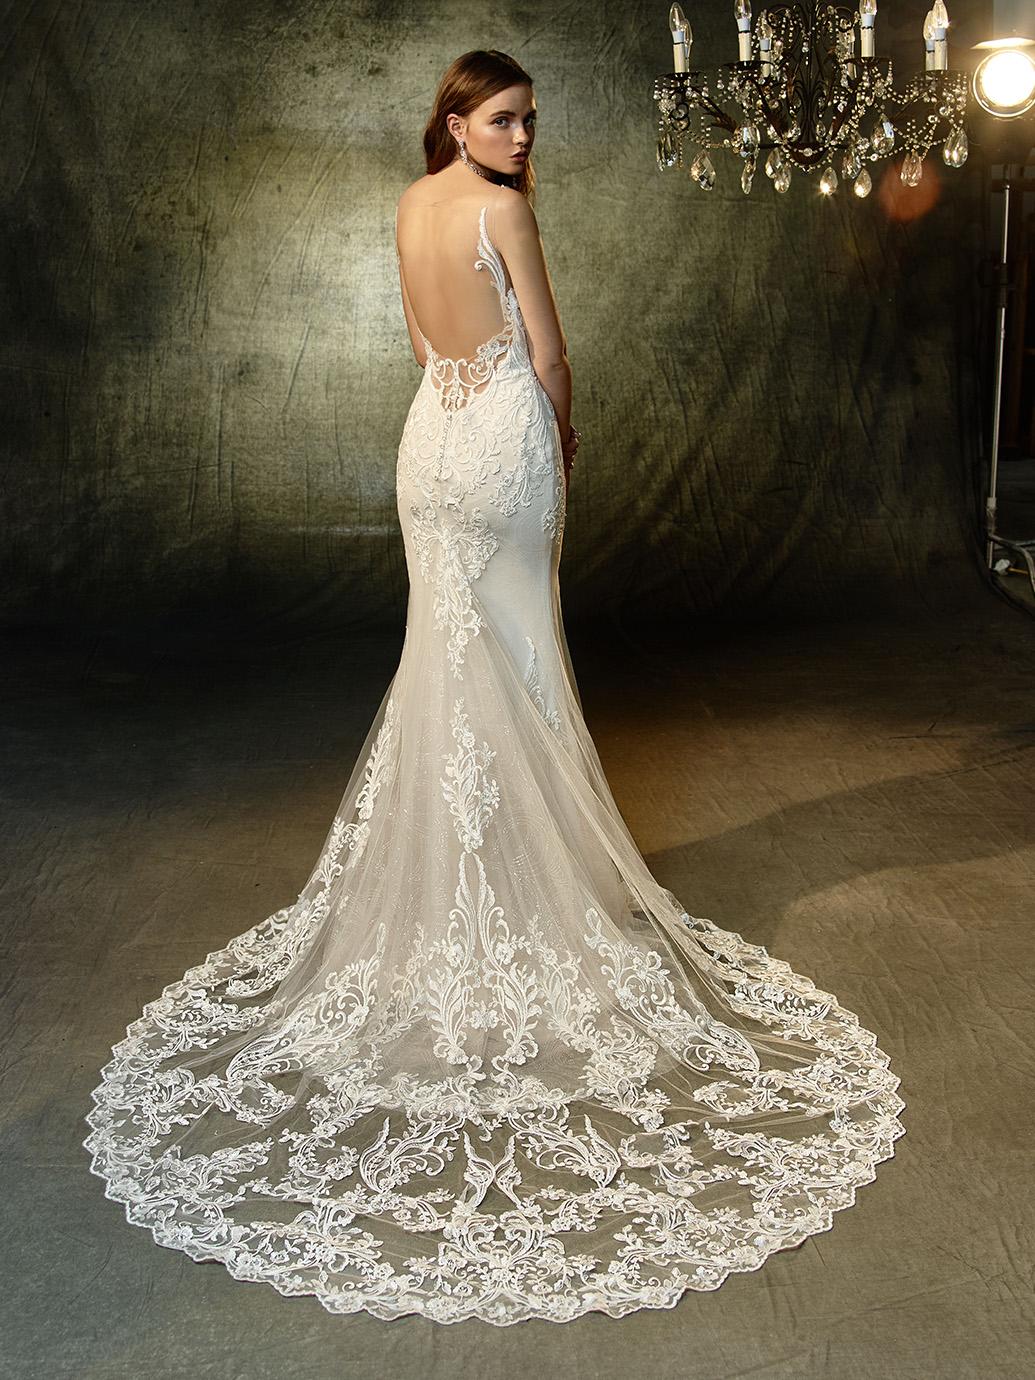 Enzoani Wedding Dress Lunaire Mermaid wedding dress with cape